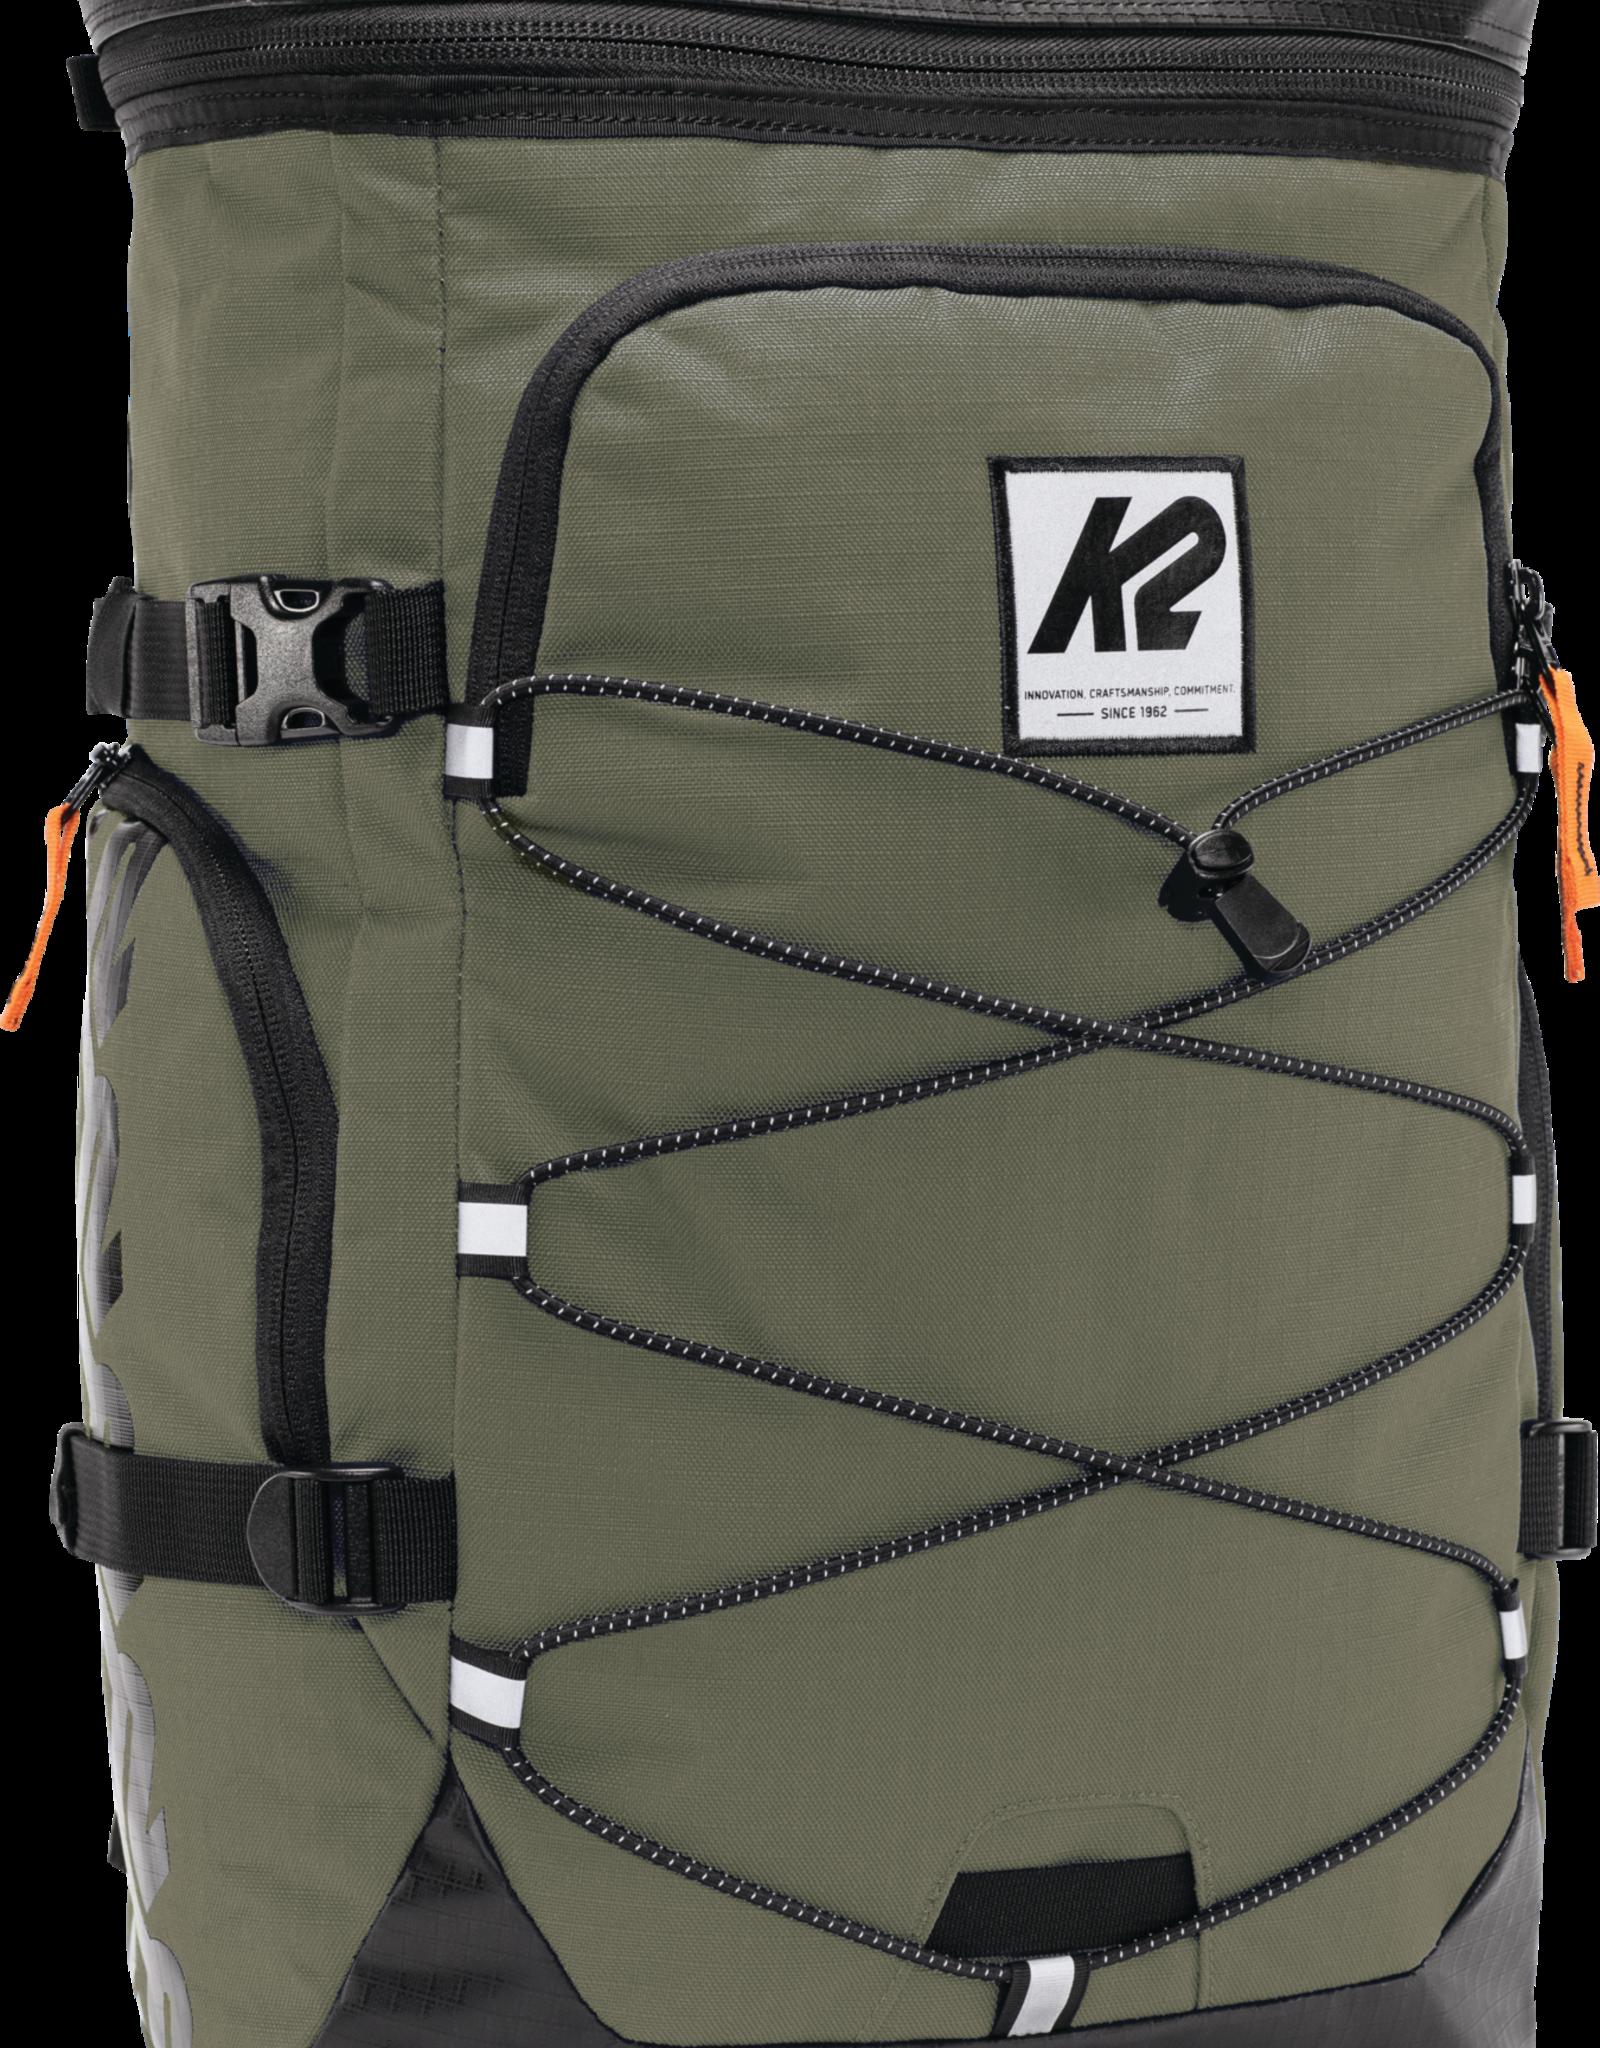 K2 K2 BACKPACK 30L Military Green